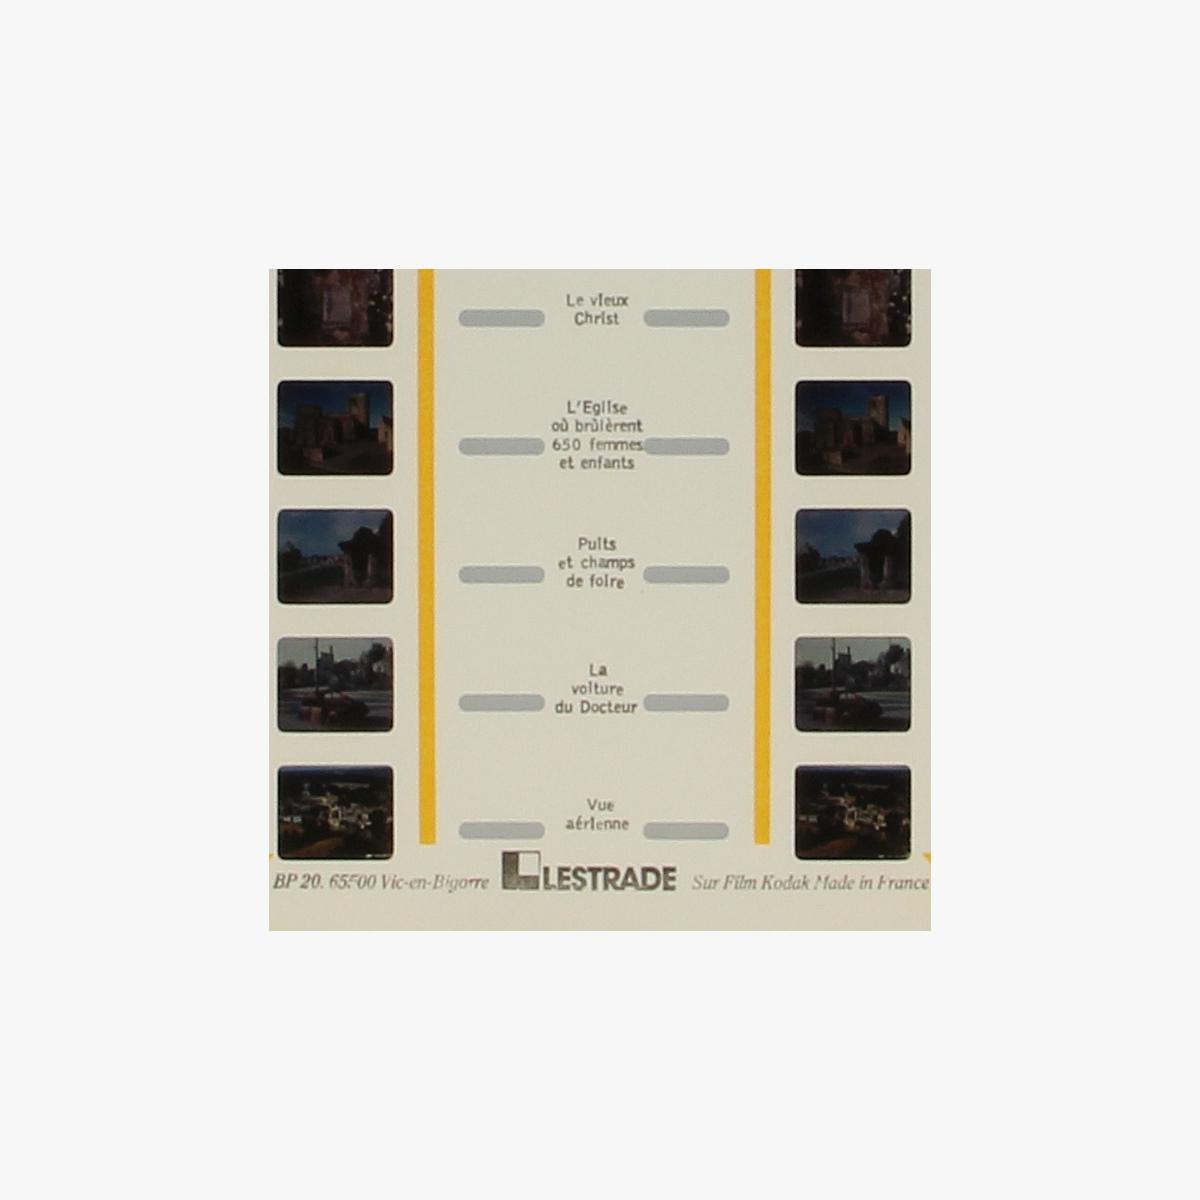 Afbeeldingen van View-Master Lestrade. Oradour-sur-Glane. Nr. 87793 en 87793b